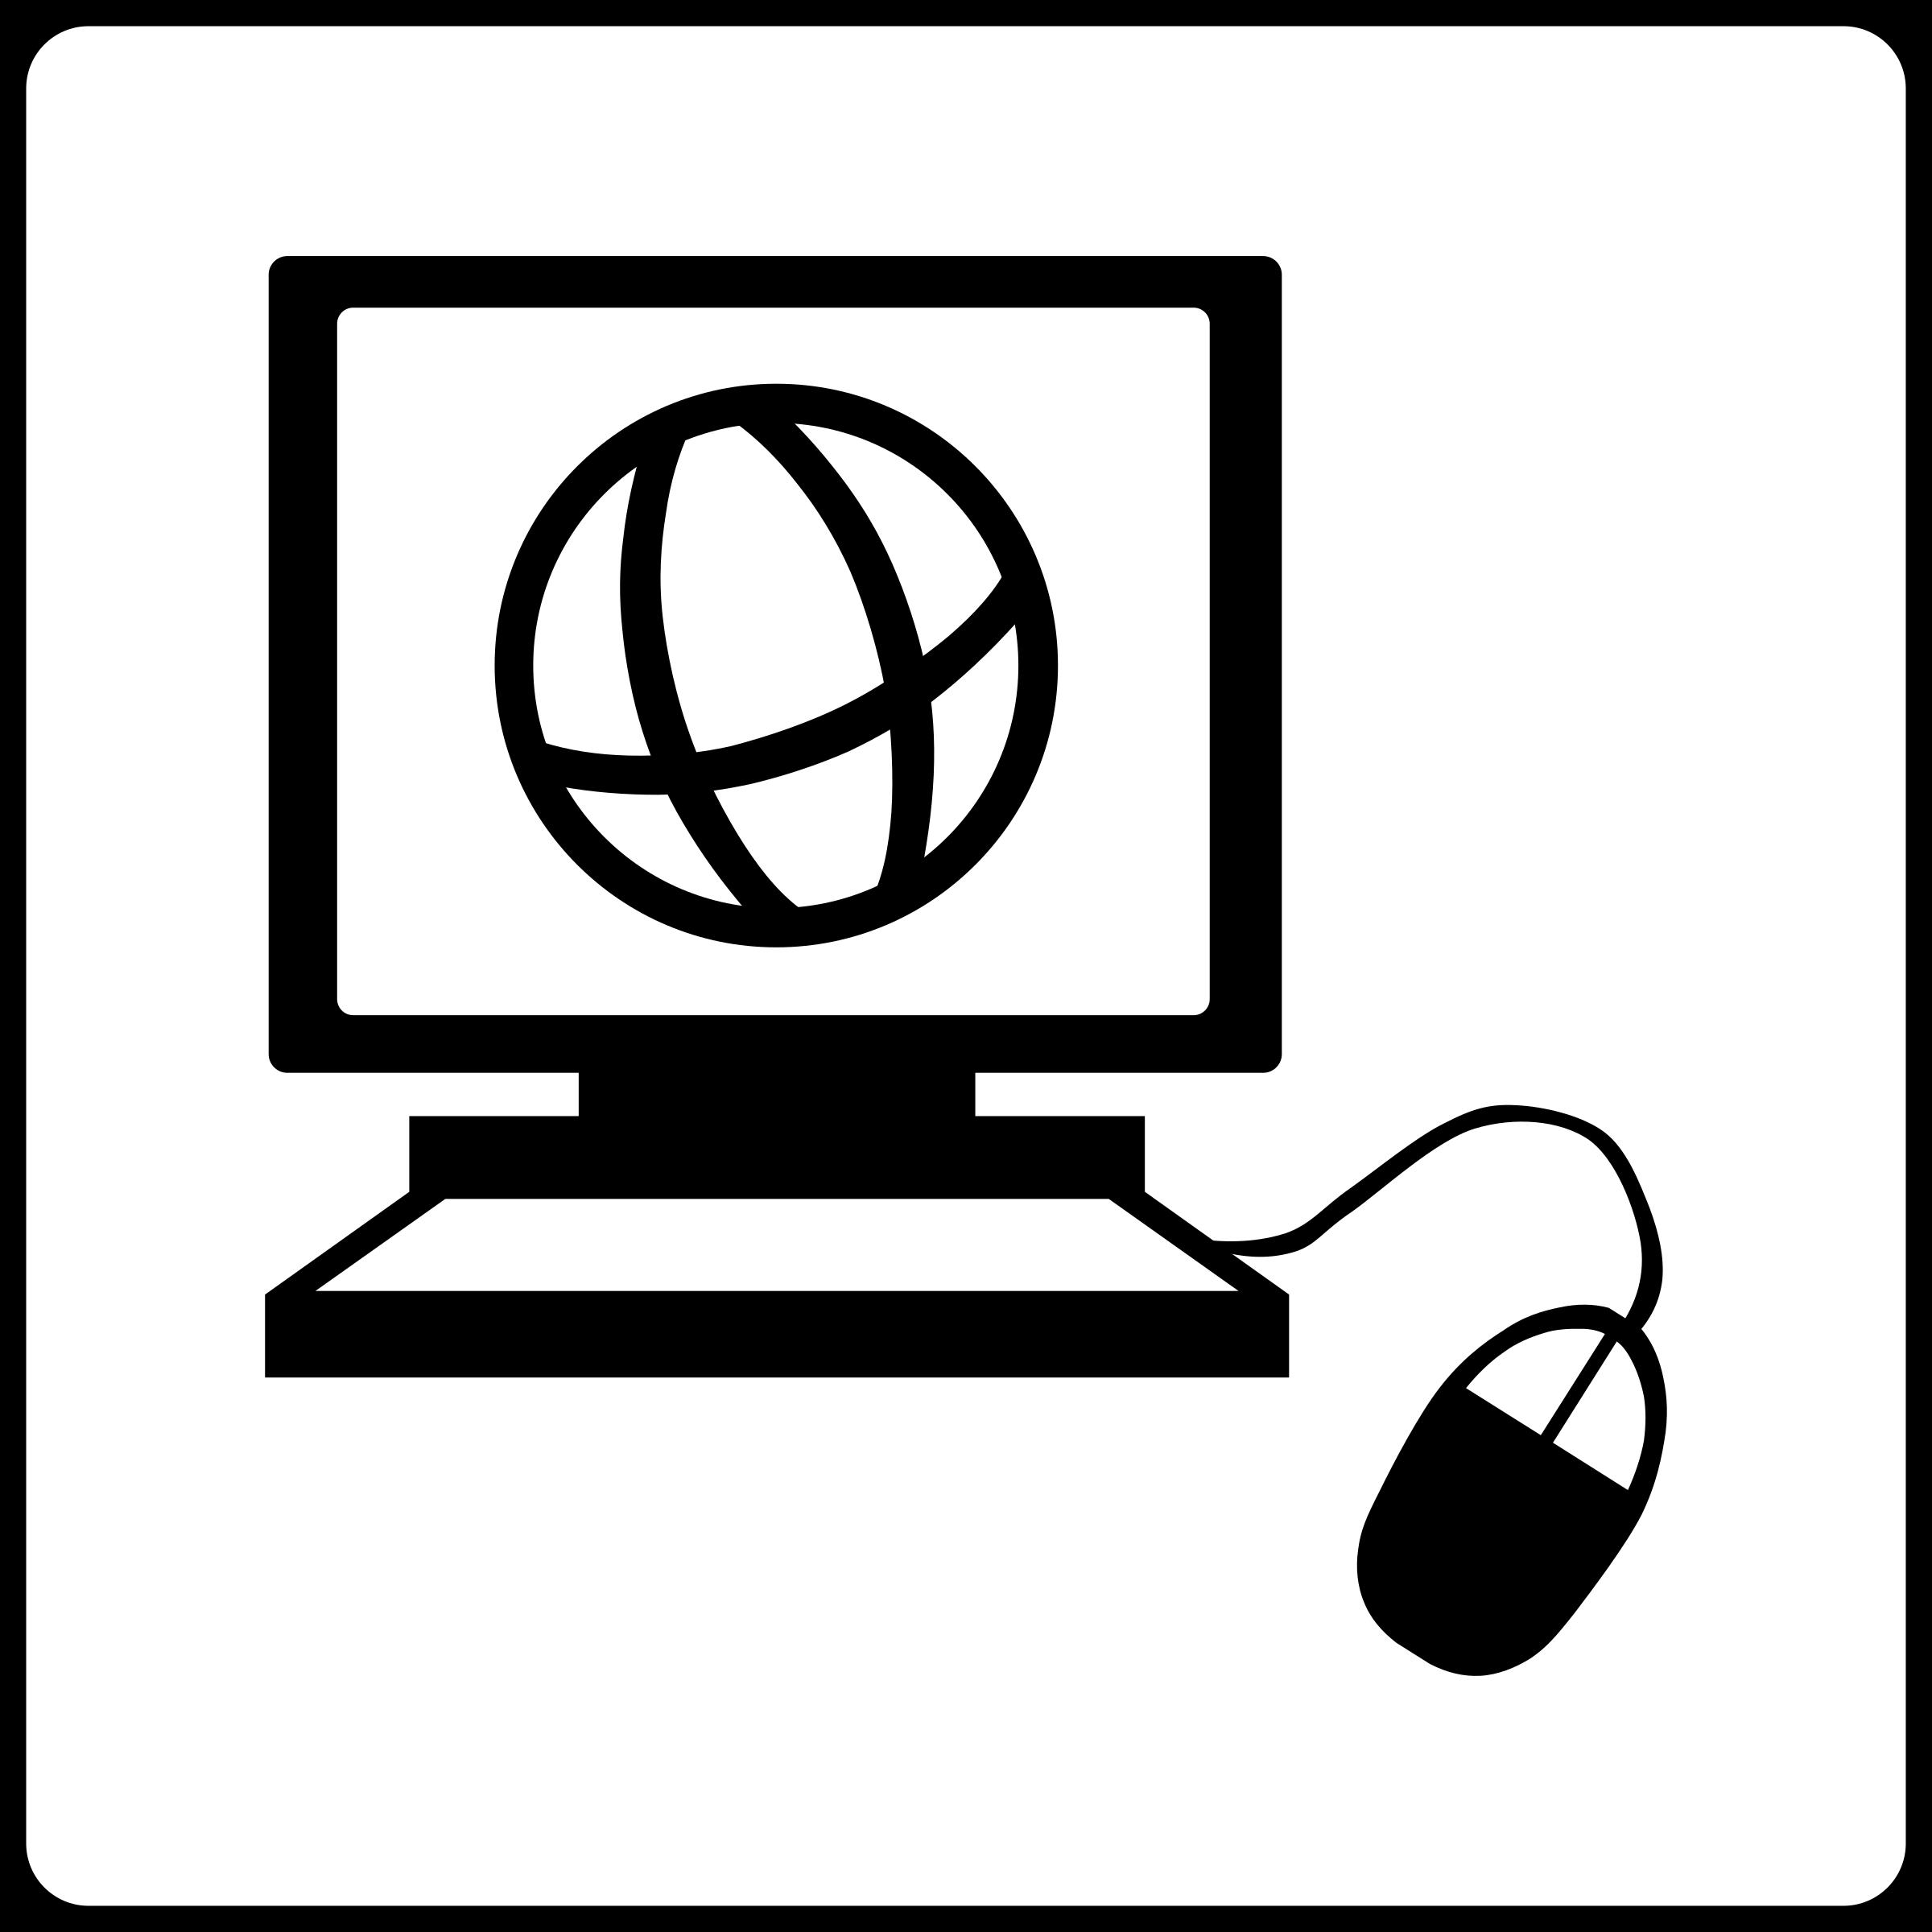 online clipart hospi noiseworks co rh hospi noiseworks co create clipart online free clip art maker free online